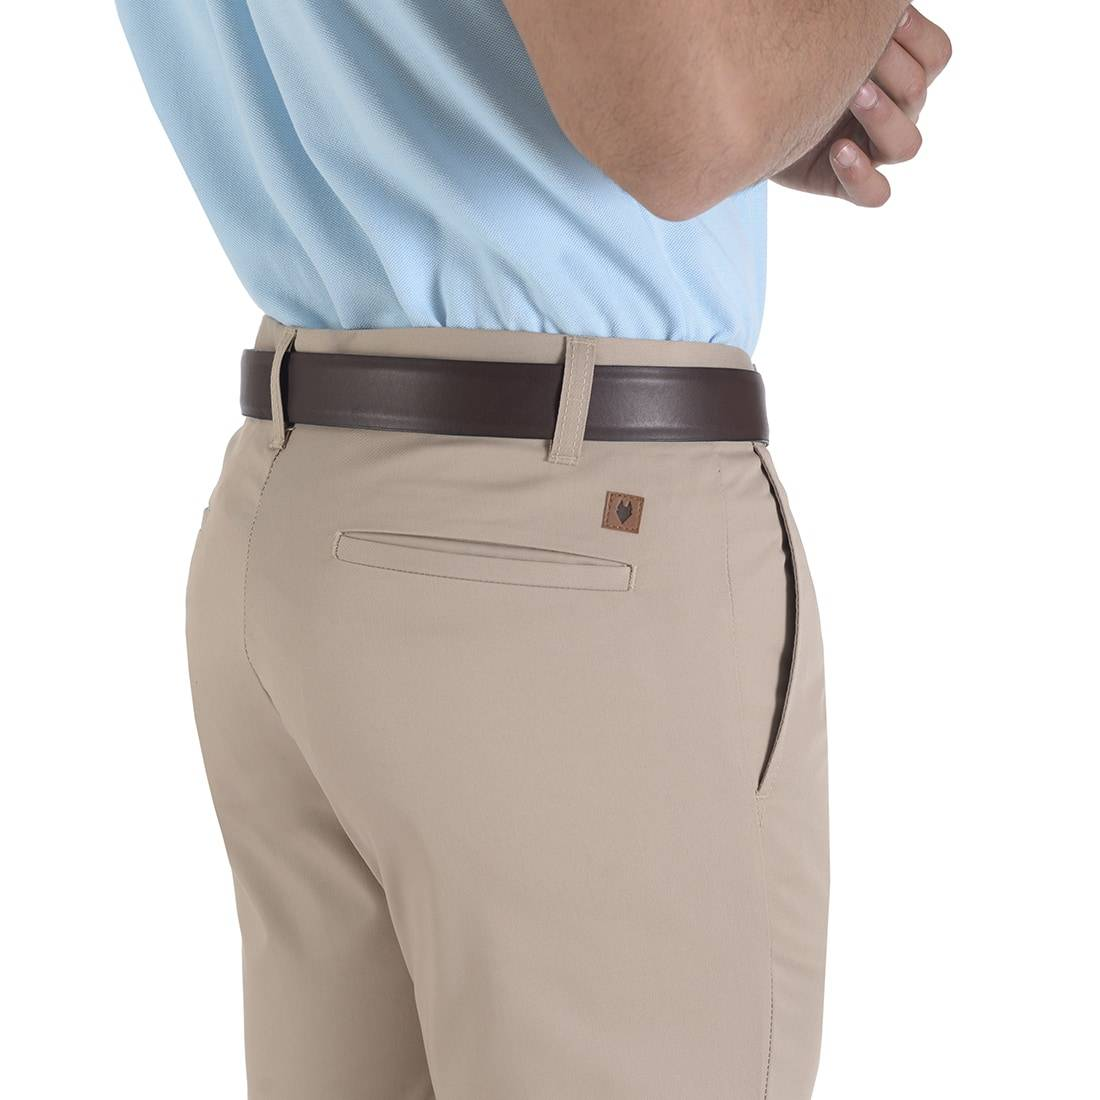 010920418961-04-Pantalon-Casual-Slim-Fit-Beige-yale